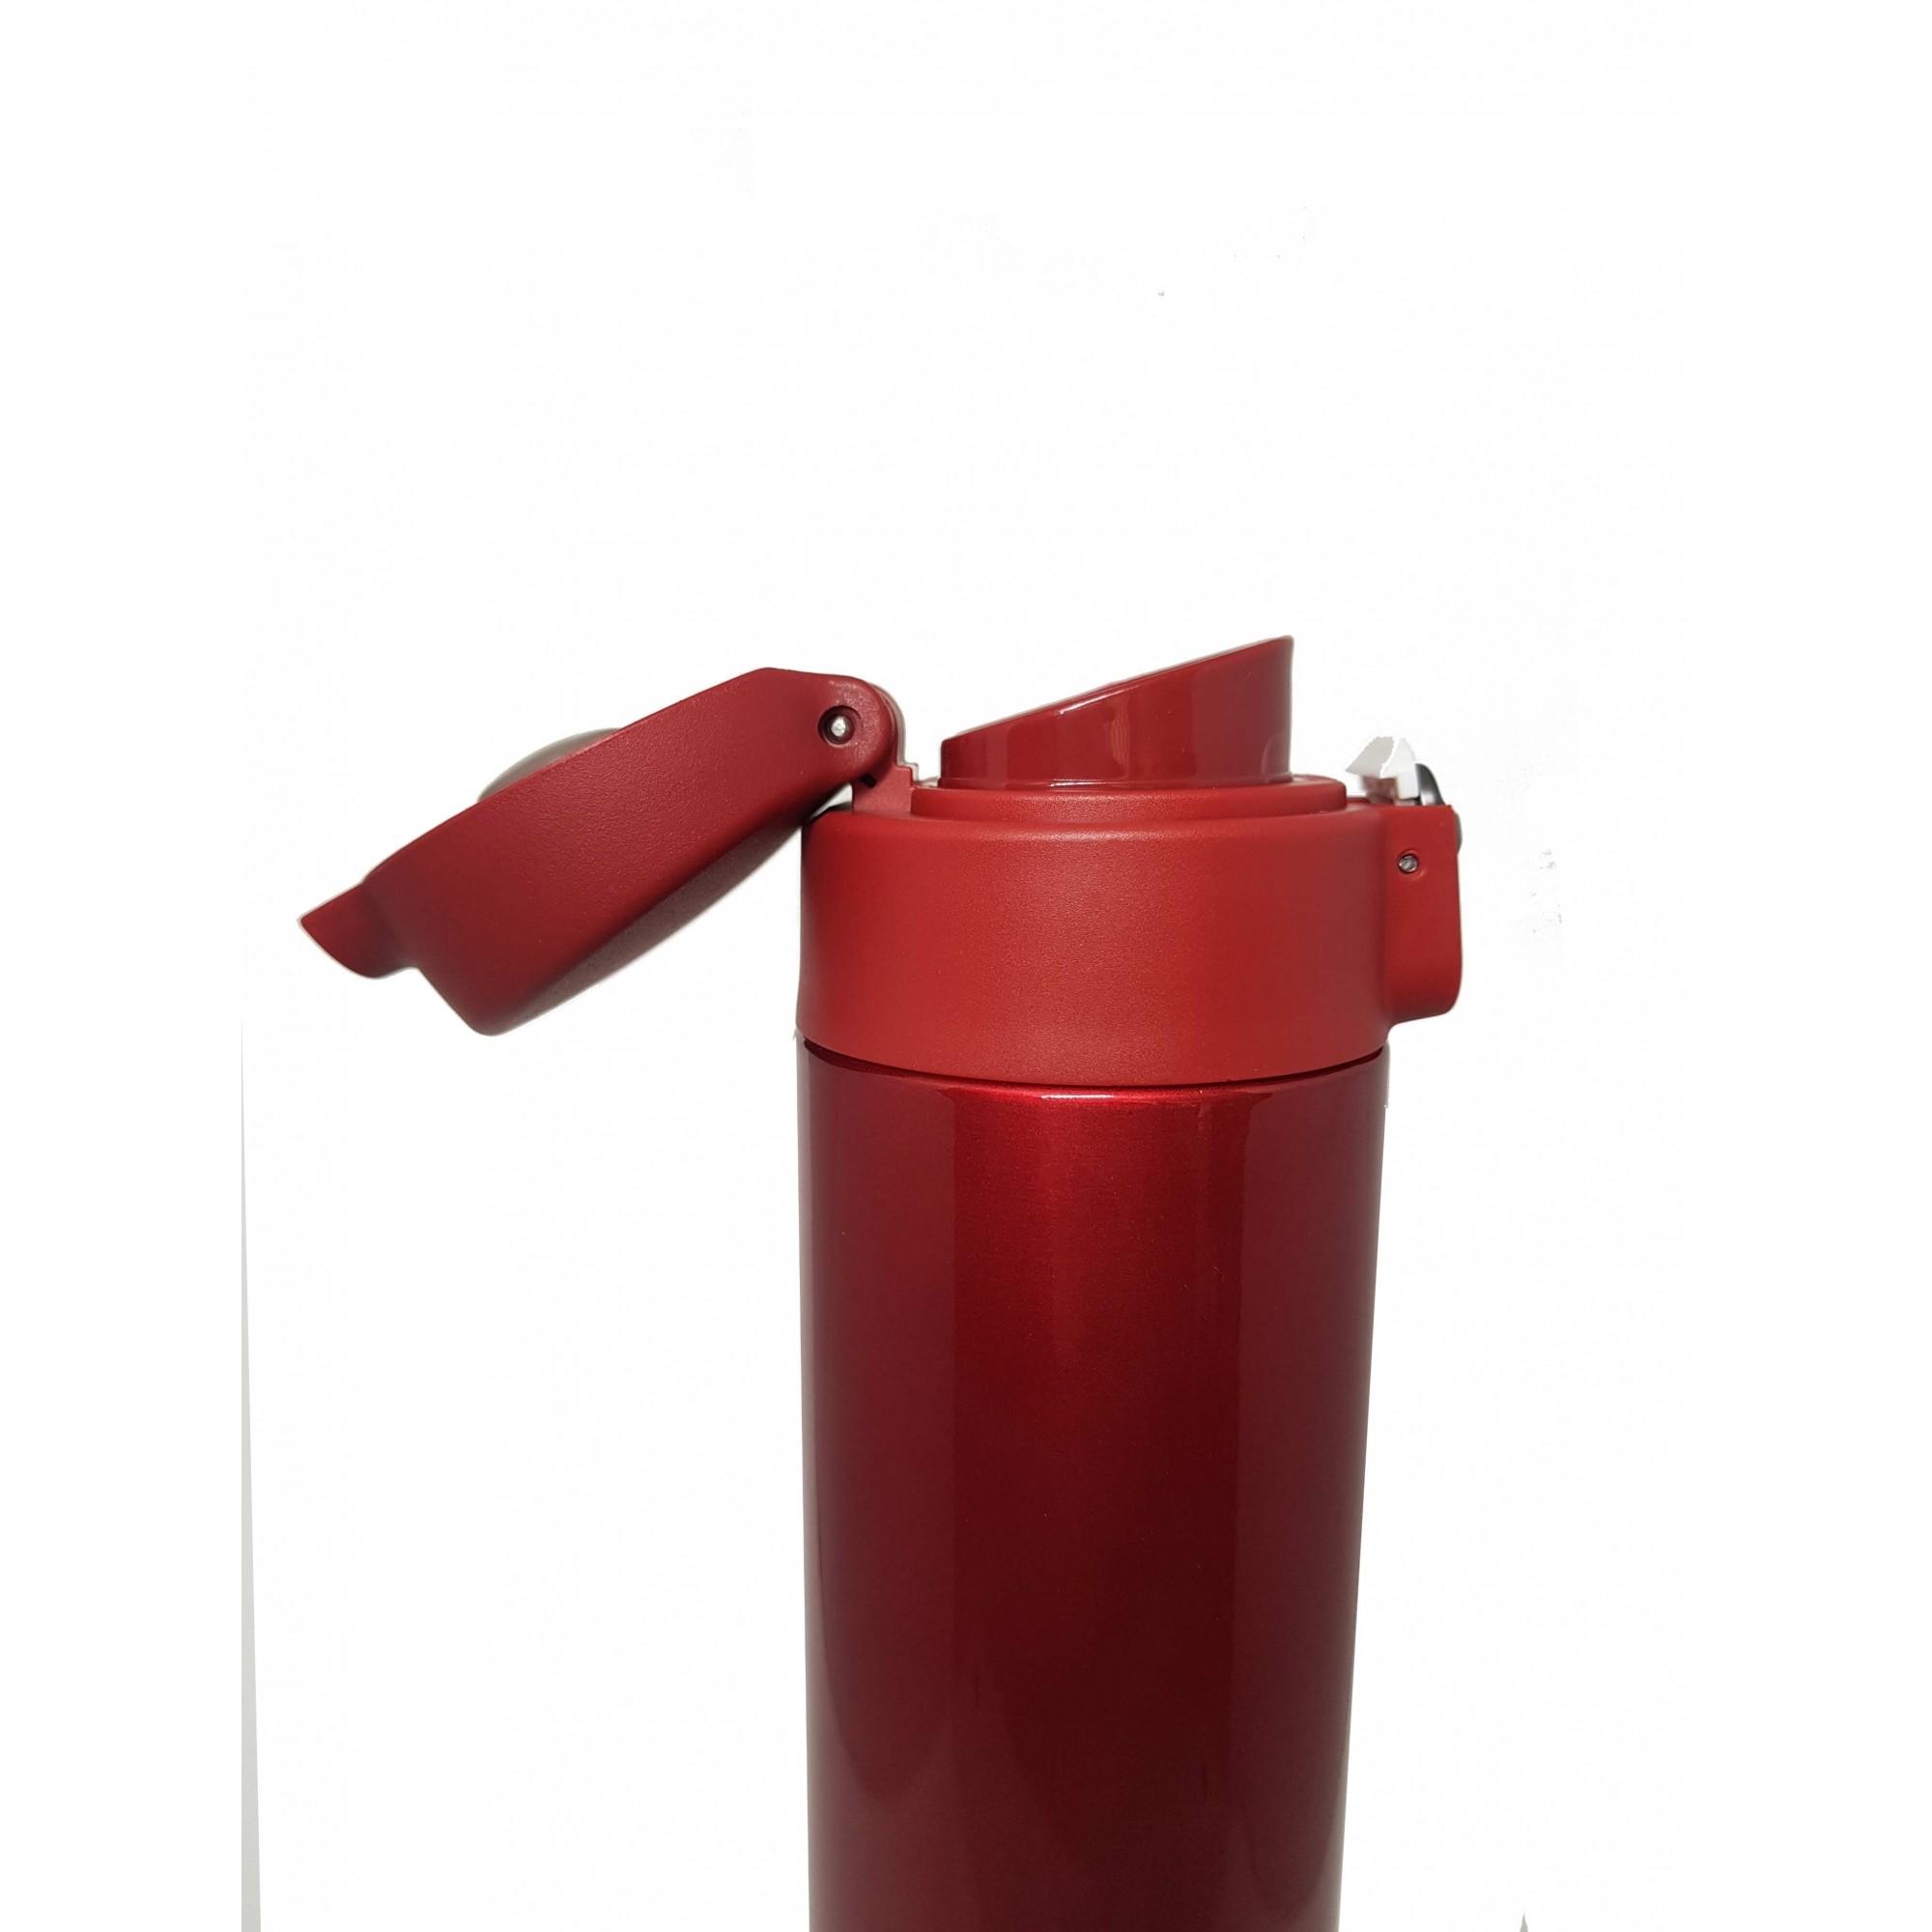 Kit Mundo Mochila + garrafa inox 500 ml Vermelha + kit 6 em 1 Dourado